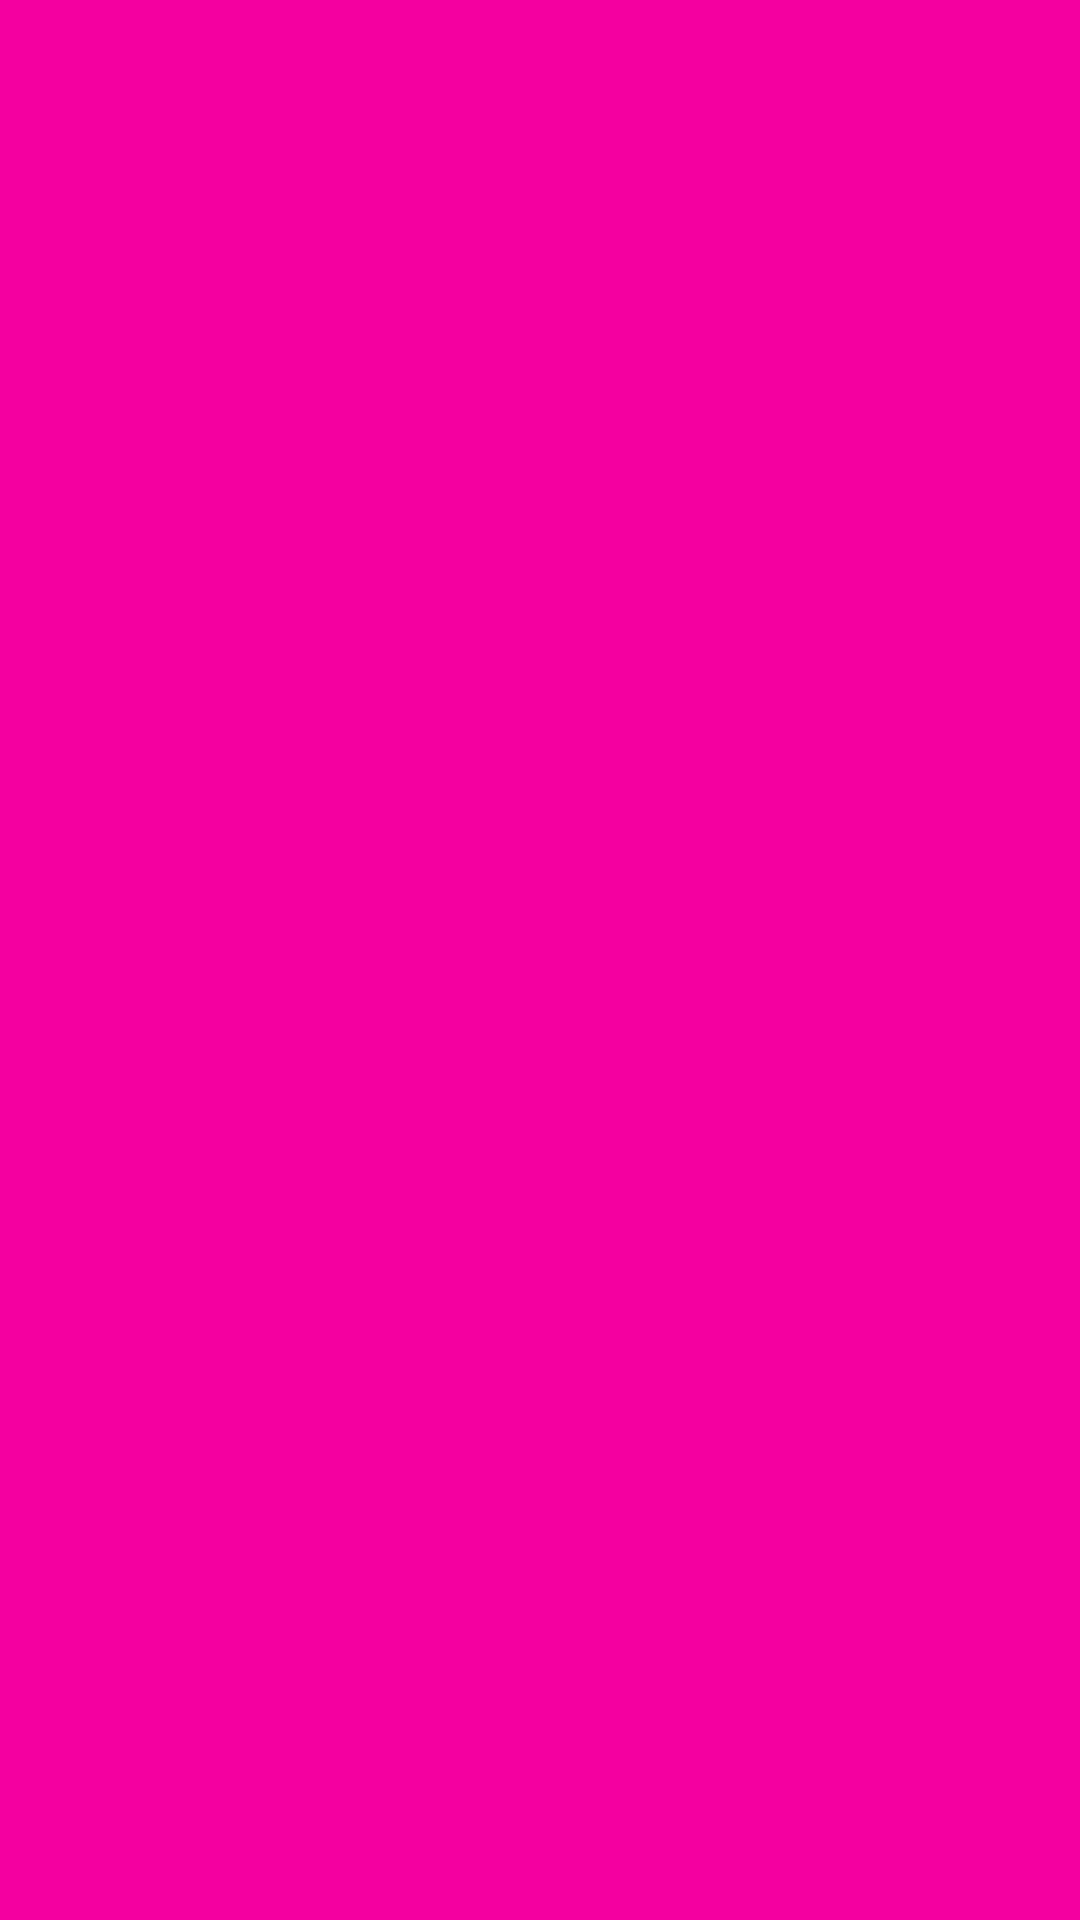 1080x1920 Fashion Fuchsia Solid Color Background